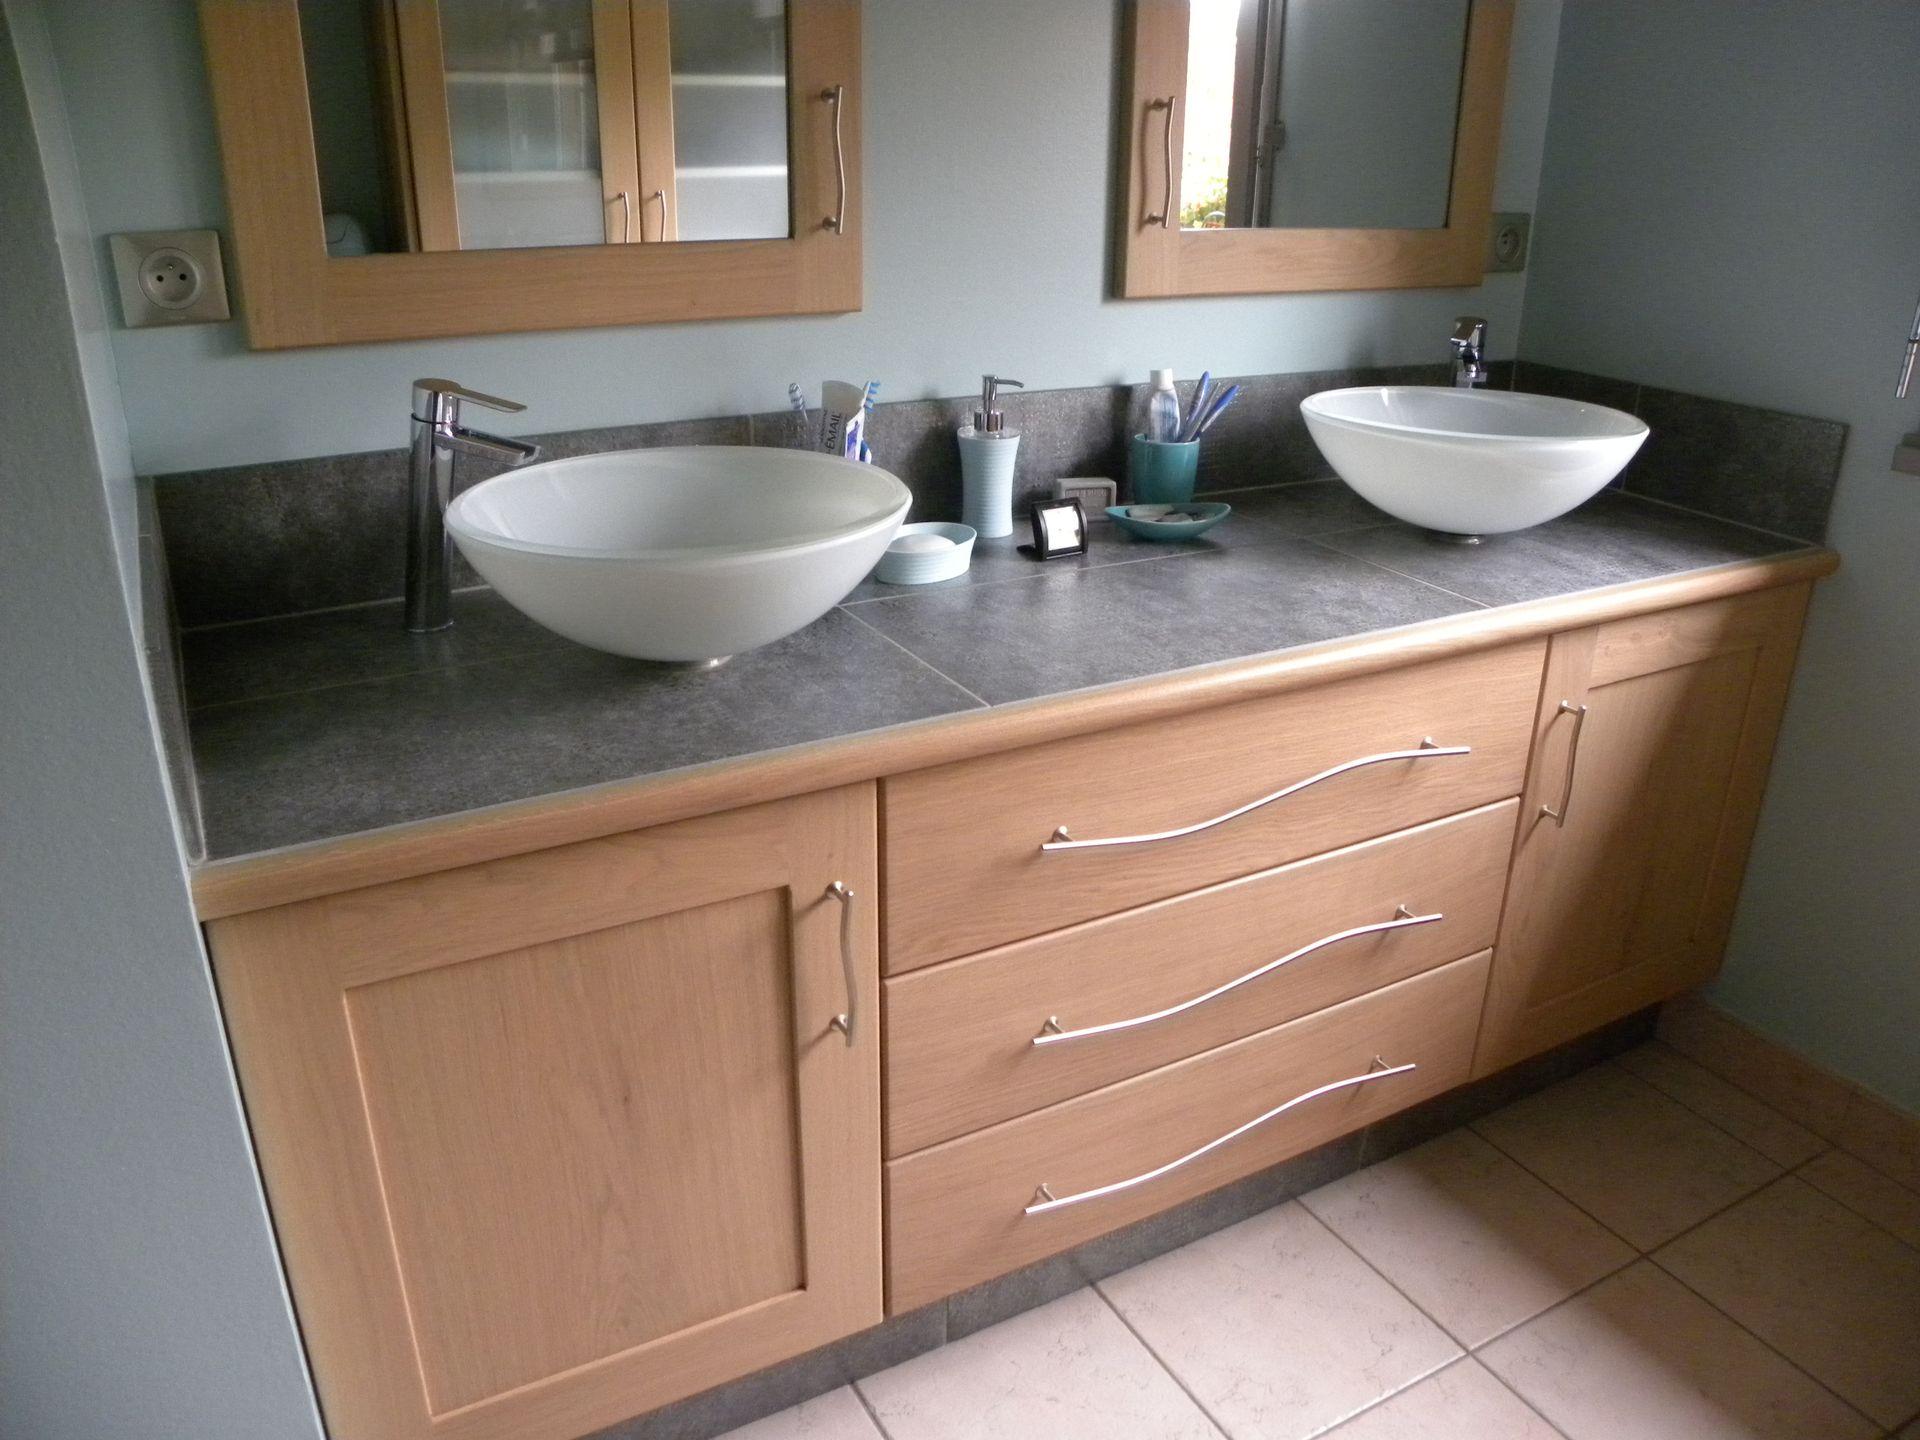 Salle de bain contemporaine bois - Faience salle de bain contemporaine ...